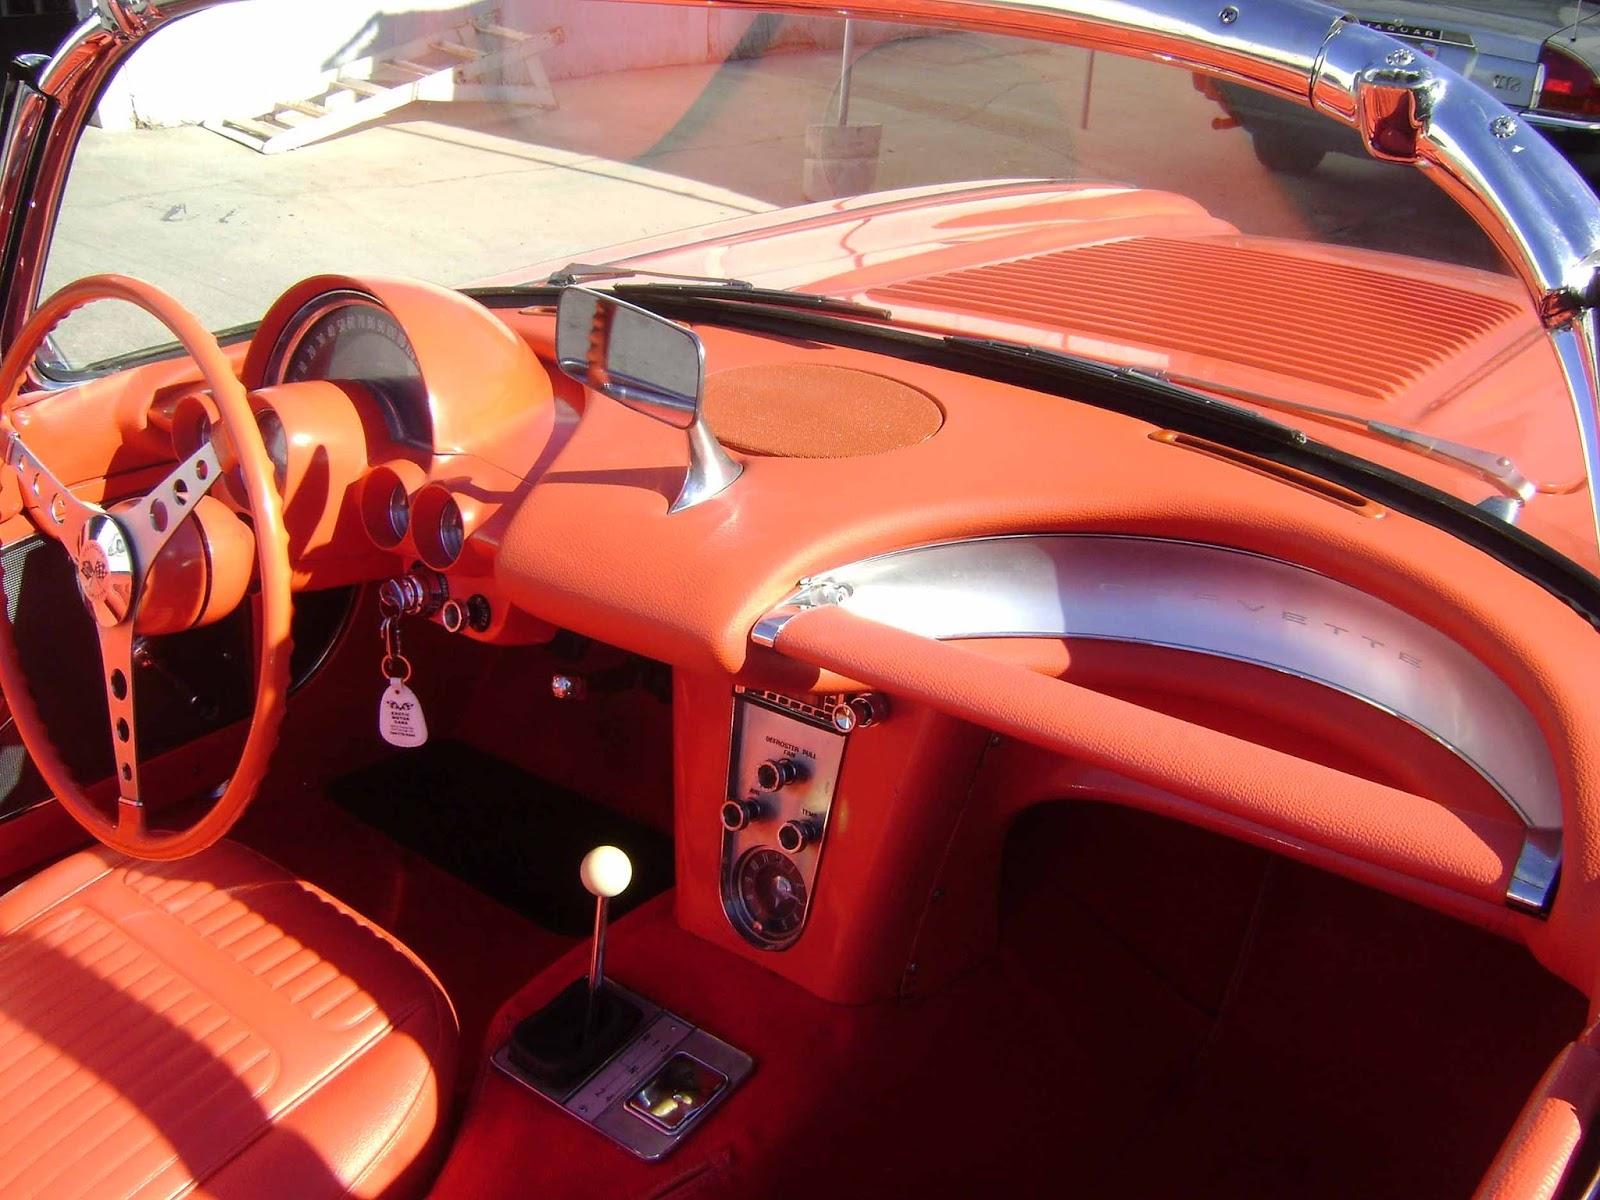 Http my classics blogspot com 2016 02 fitech efi conversion 1958 corvette 283 html http my classics blogspot com 2016 04 heights car show april 2016